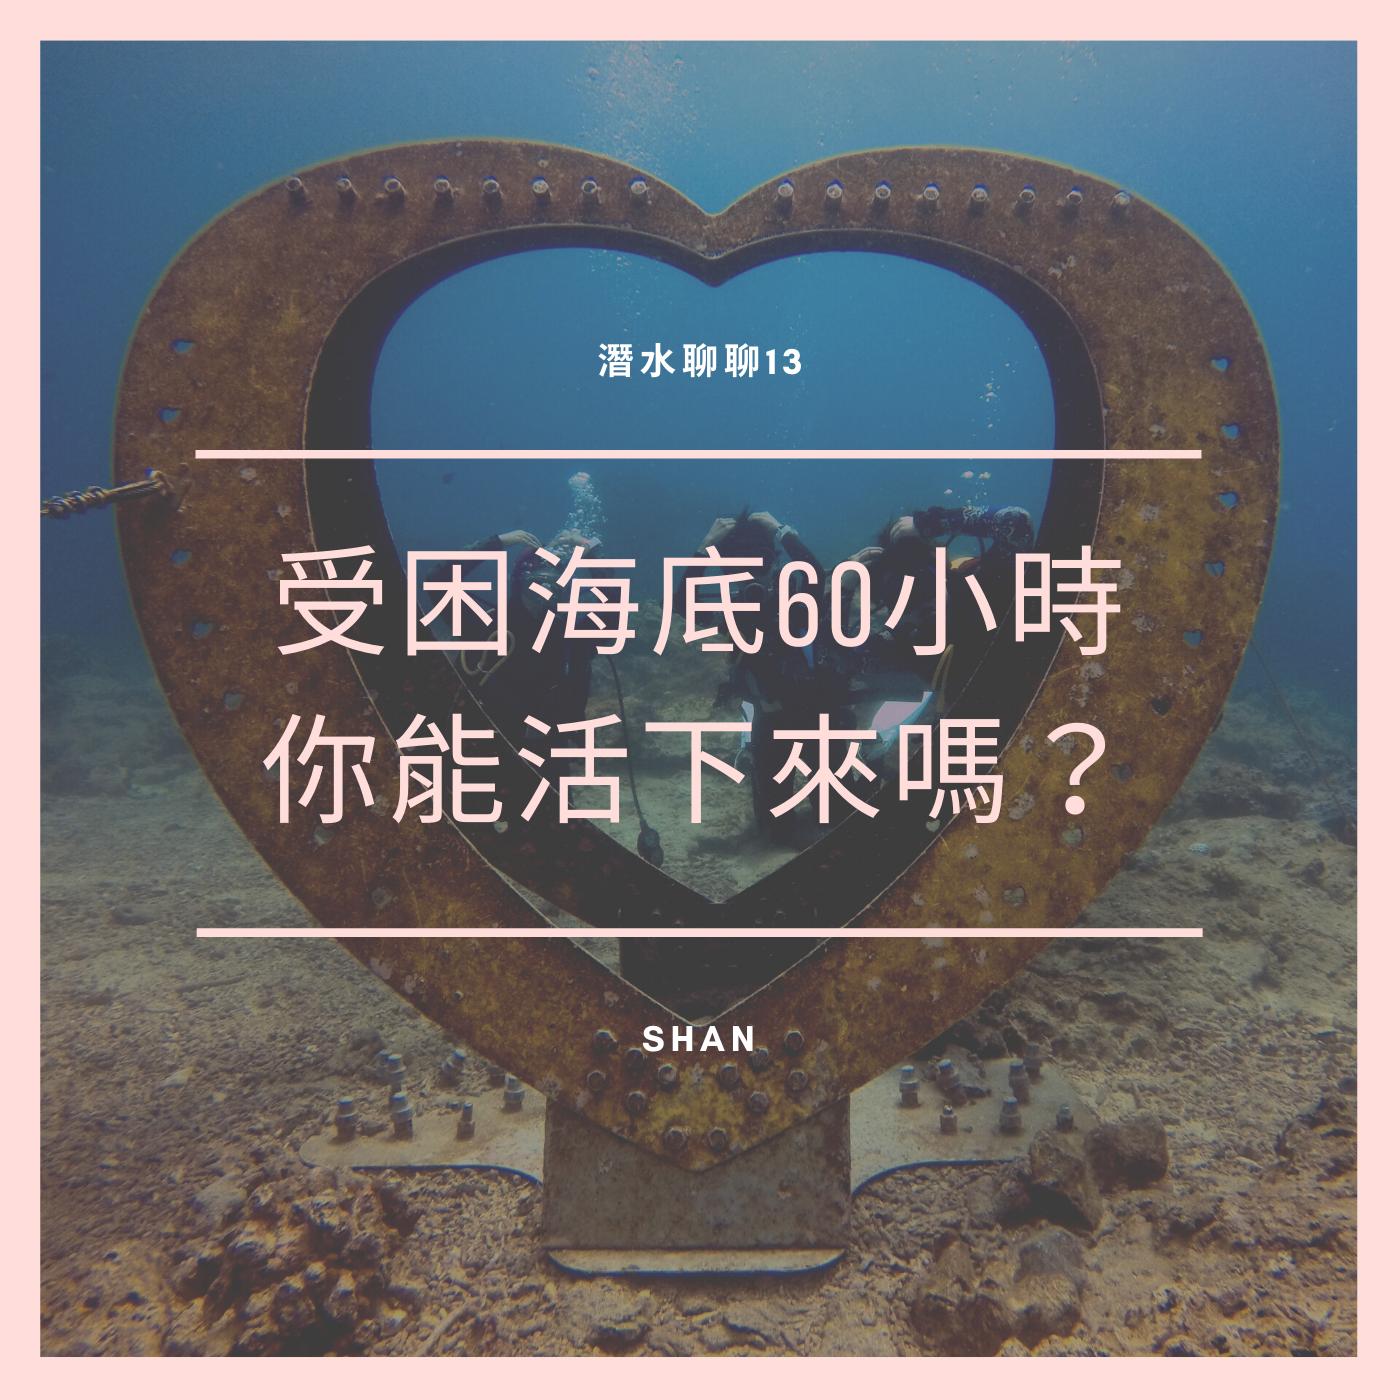 EP43 潛水聊聊13:受困海底60 小時,你能活下來嗎?